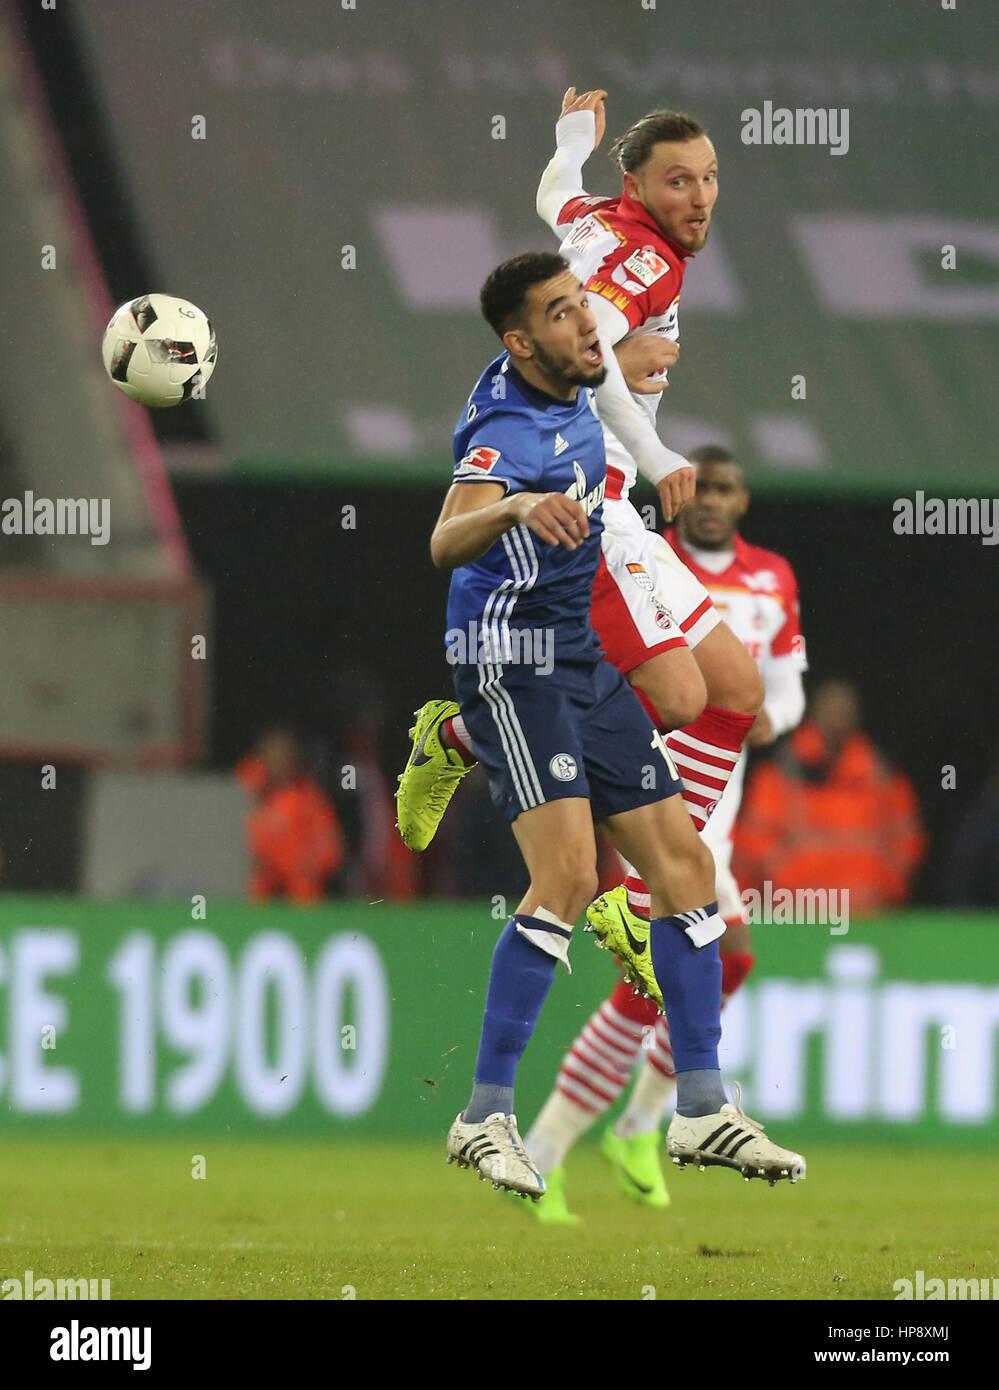 Cologne, Germany, February 19, 2017, Bundesliga matchday 21, 1. FC Koeln - FC Schalke 04:  Tackling Nabil Bentaleb - Stock Image